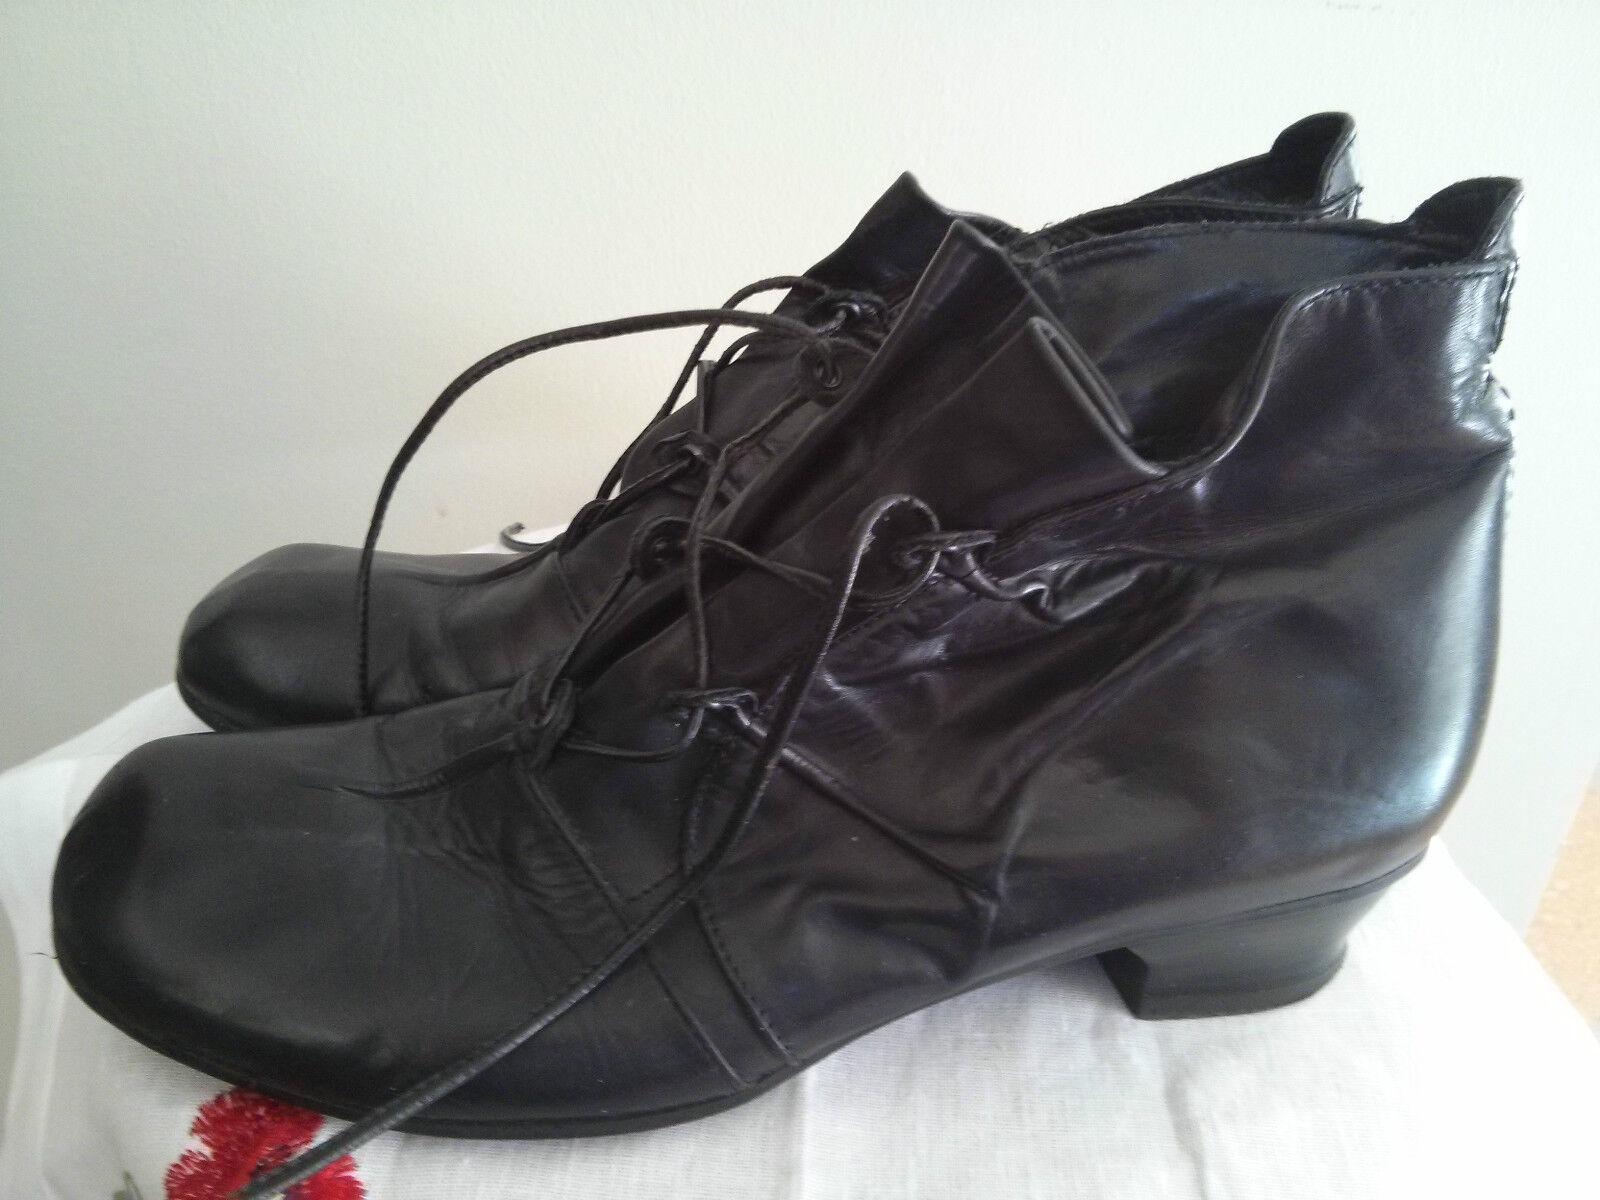 S FRATELITA CALSOLARI REGNATI womens leather boots, size 9.5 US, made in